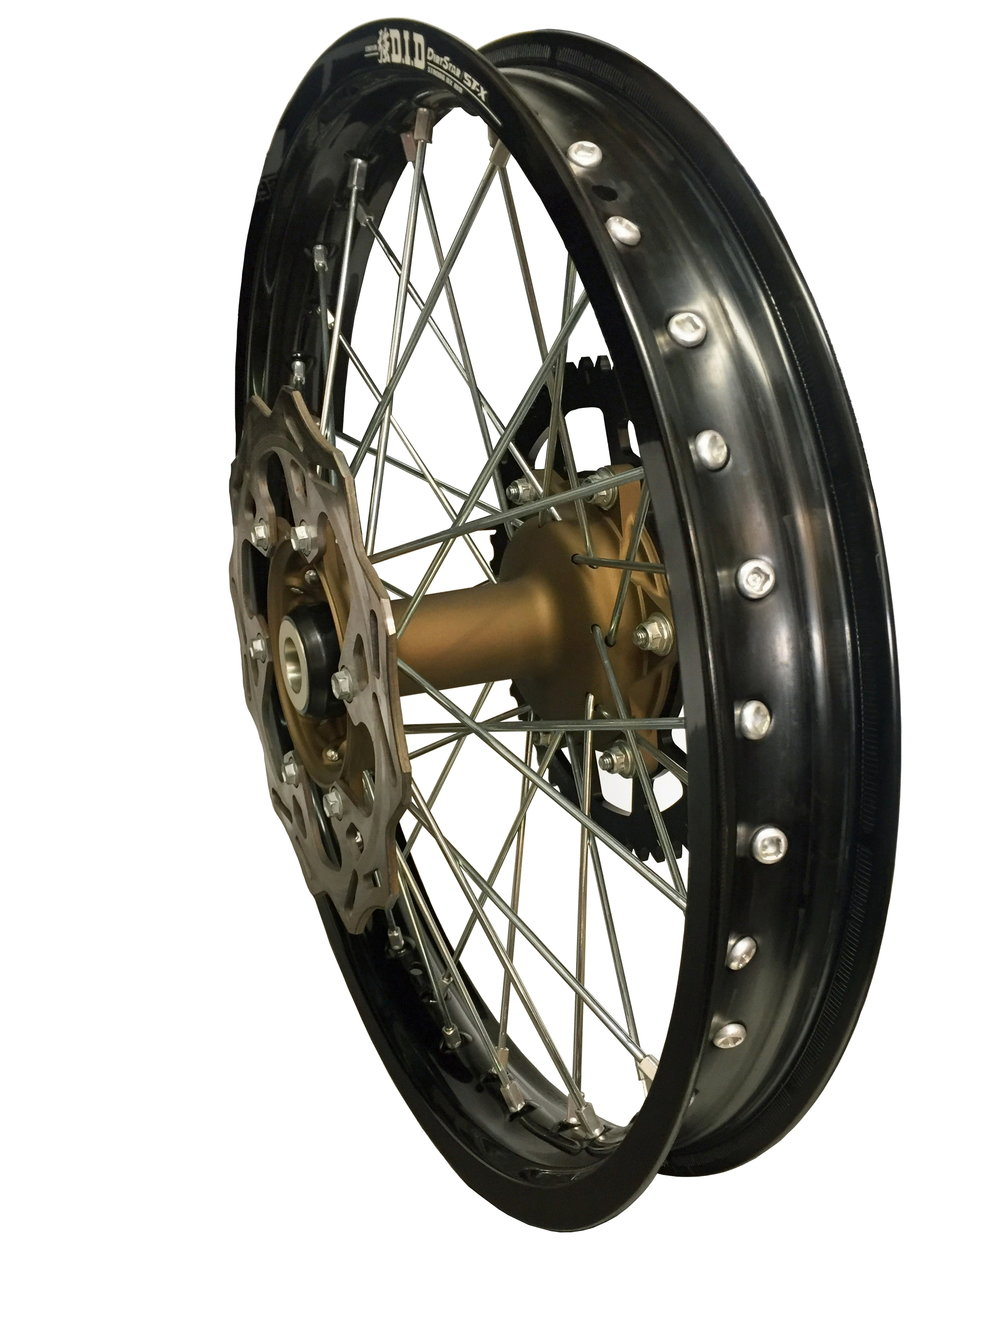 wheel photo#2.JPG